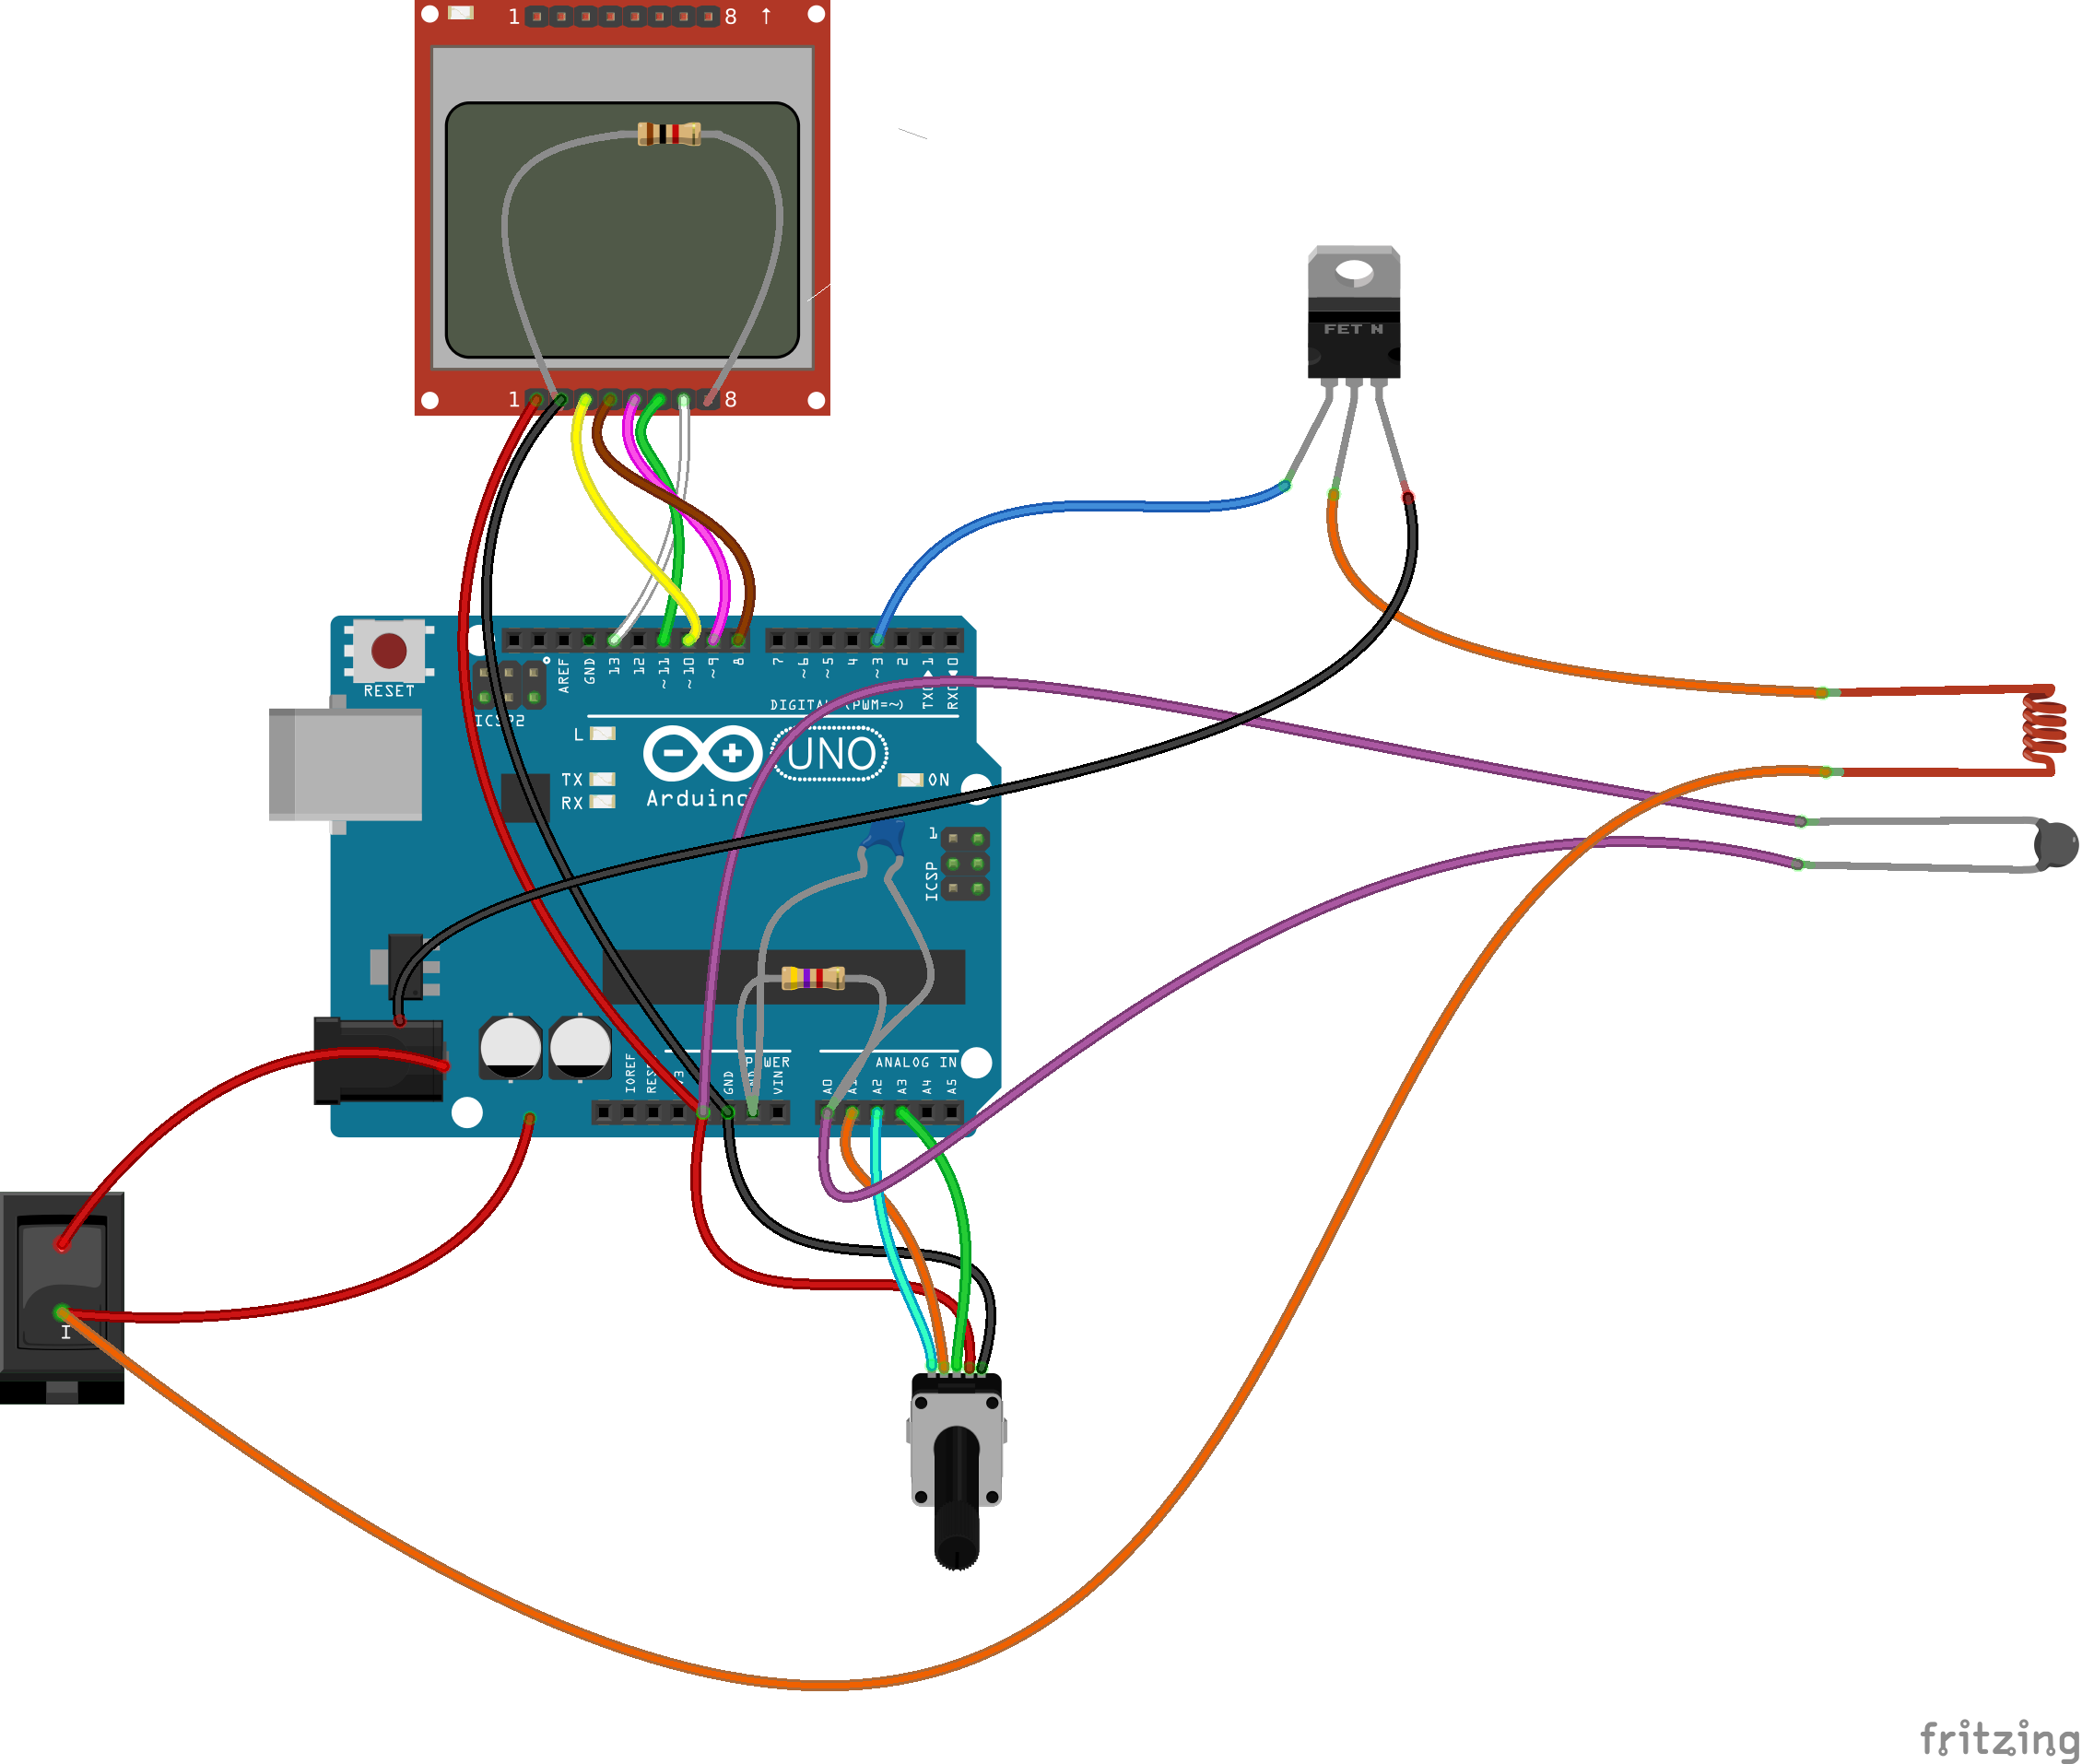 Micro soldering station hackster diagram fritzing bb jvvhnidphb cheapraybanclubmaster Images